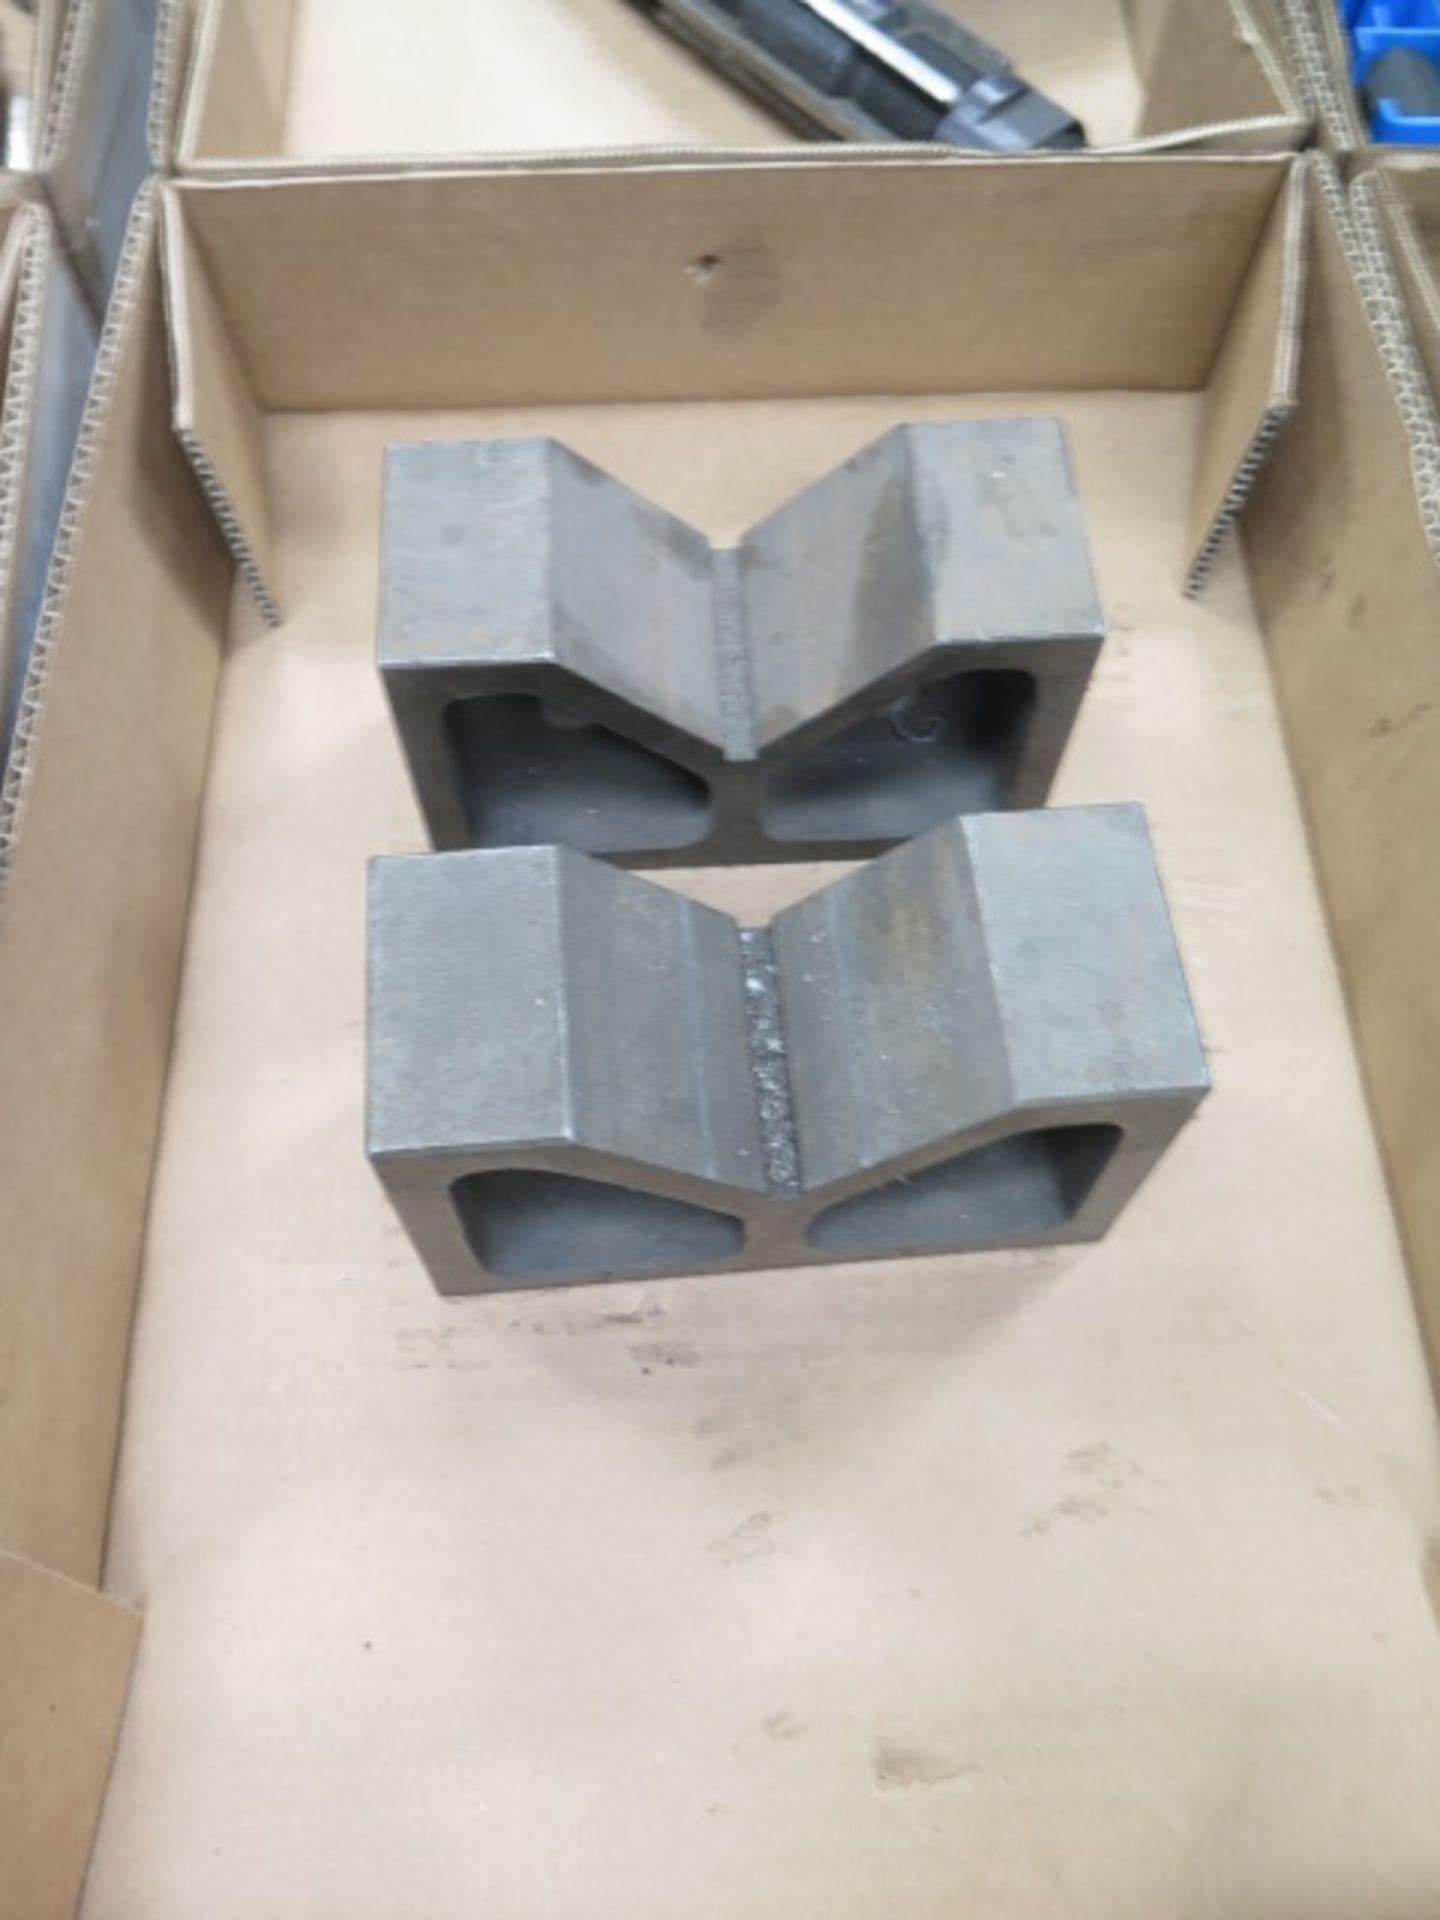 Lotto 64 - V-Blocks, Radius Cutters and Adjustable Reamer